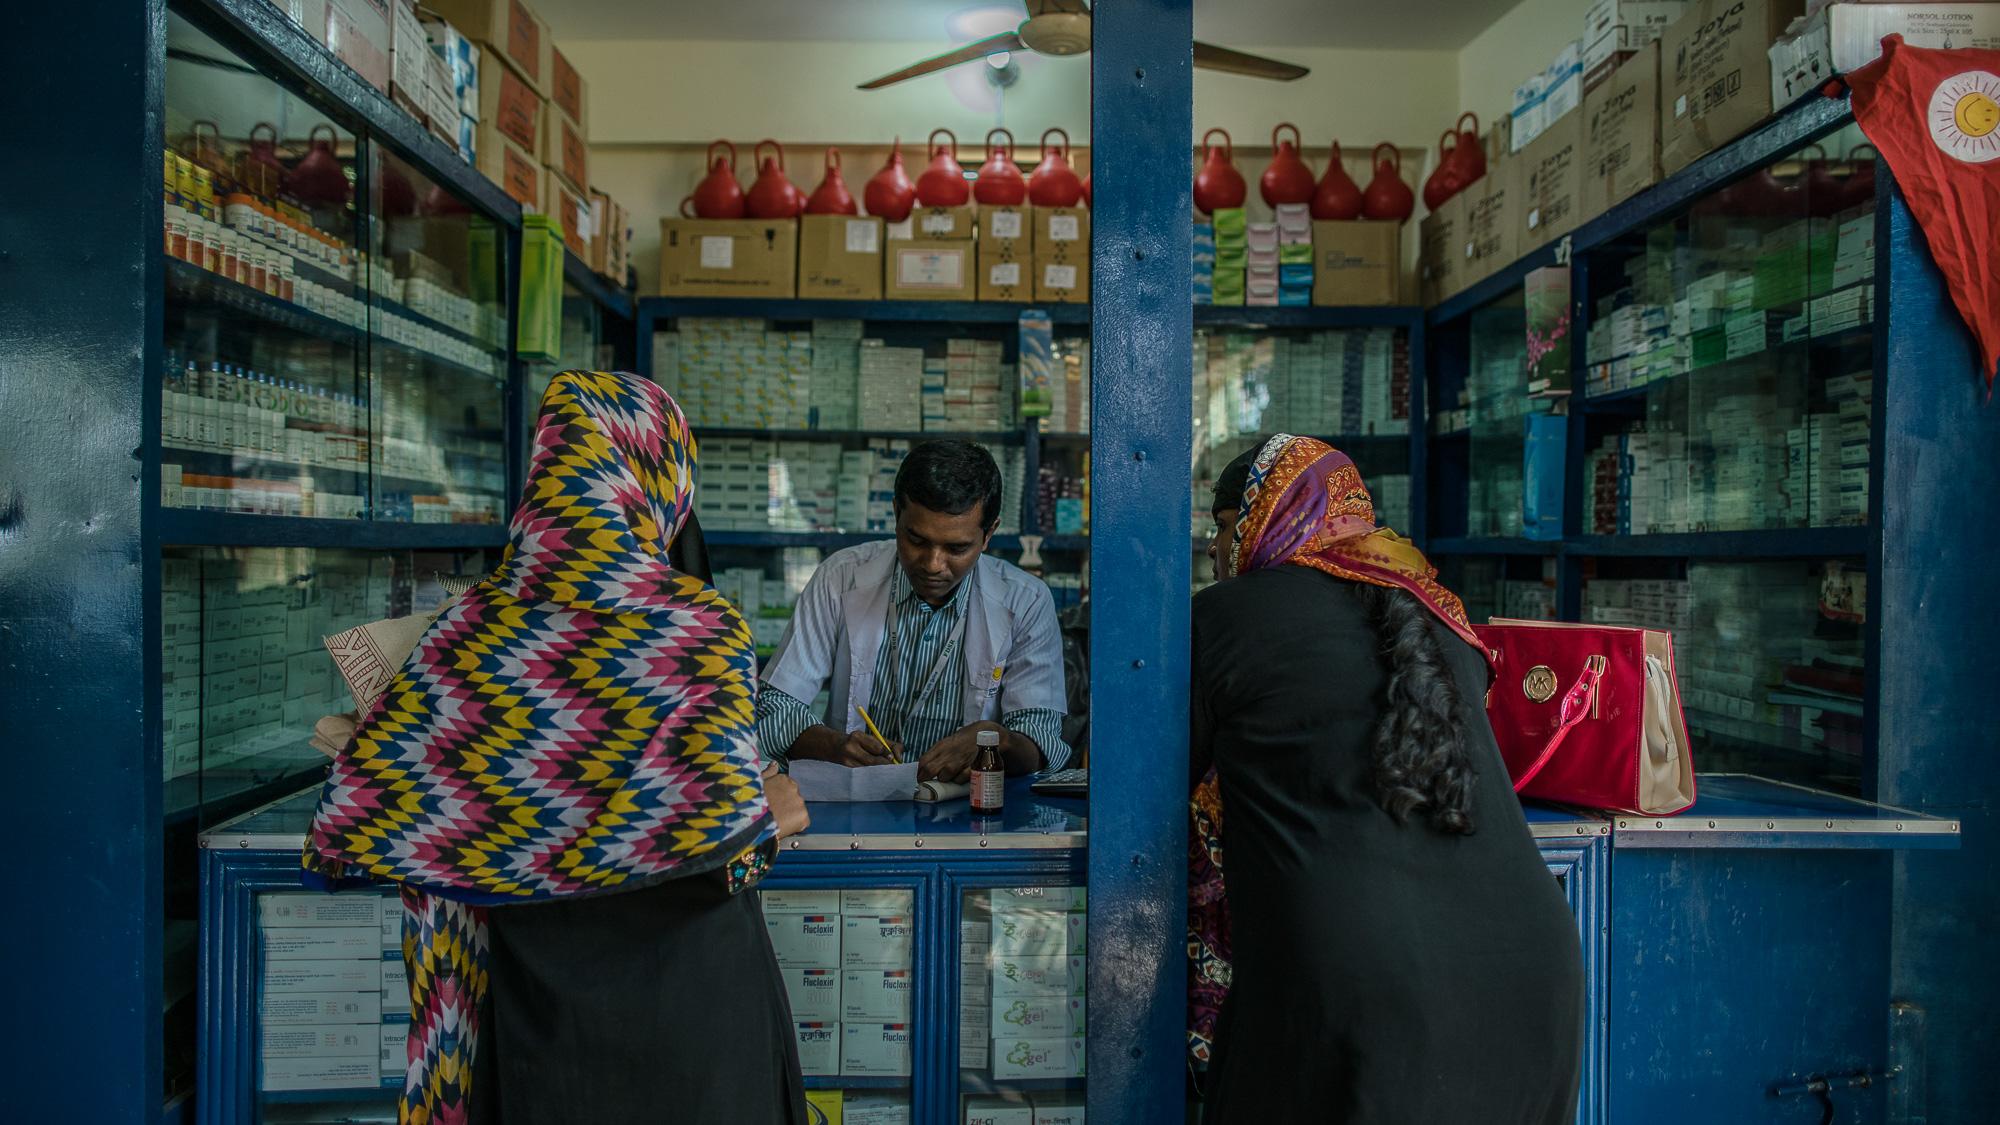 Smiling Sun Clinic in Chittagong, Bangladesh.